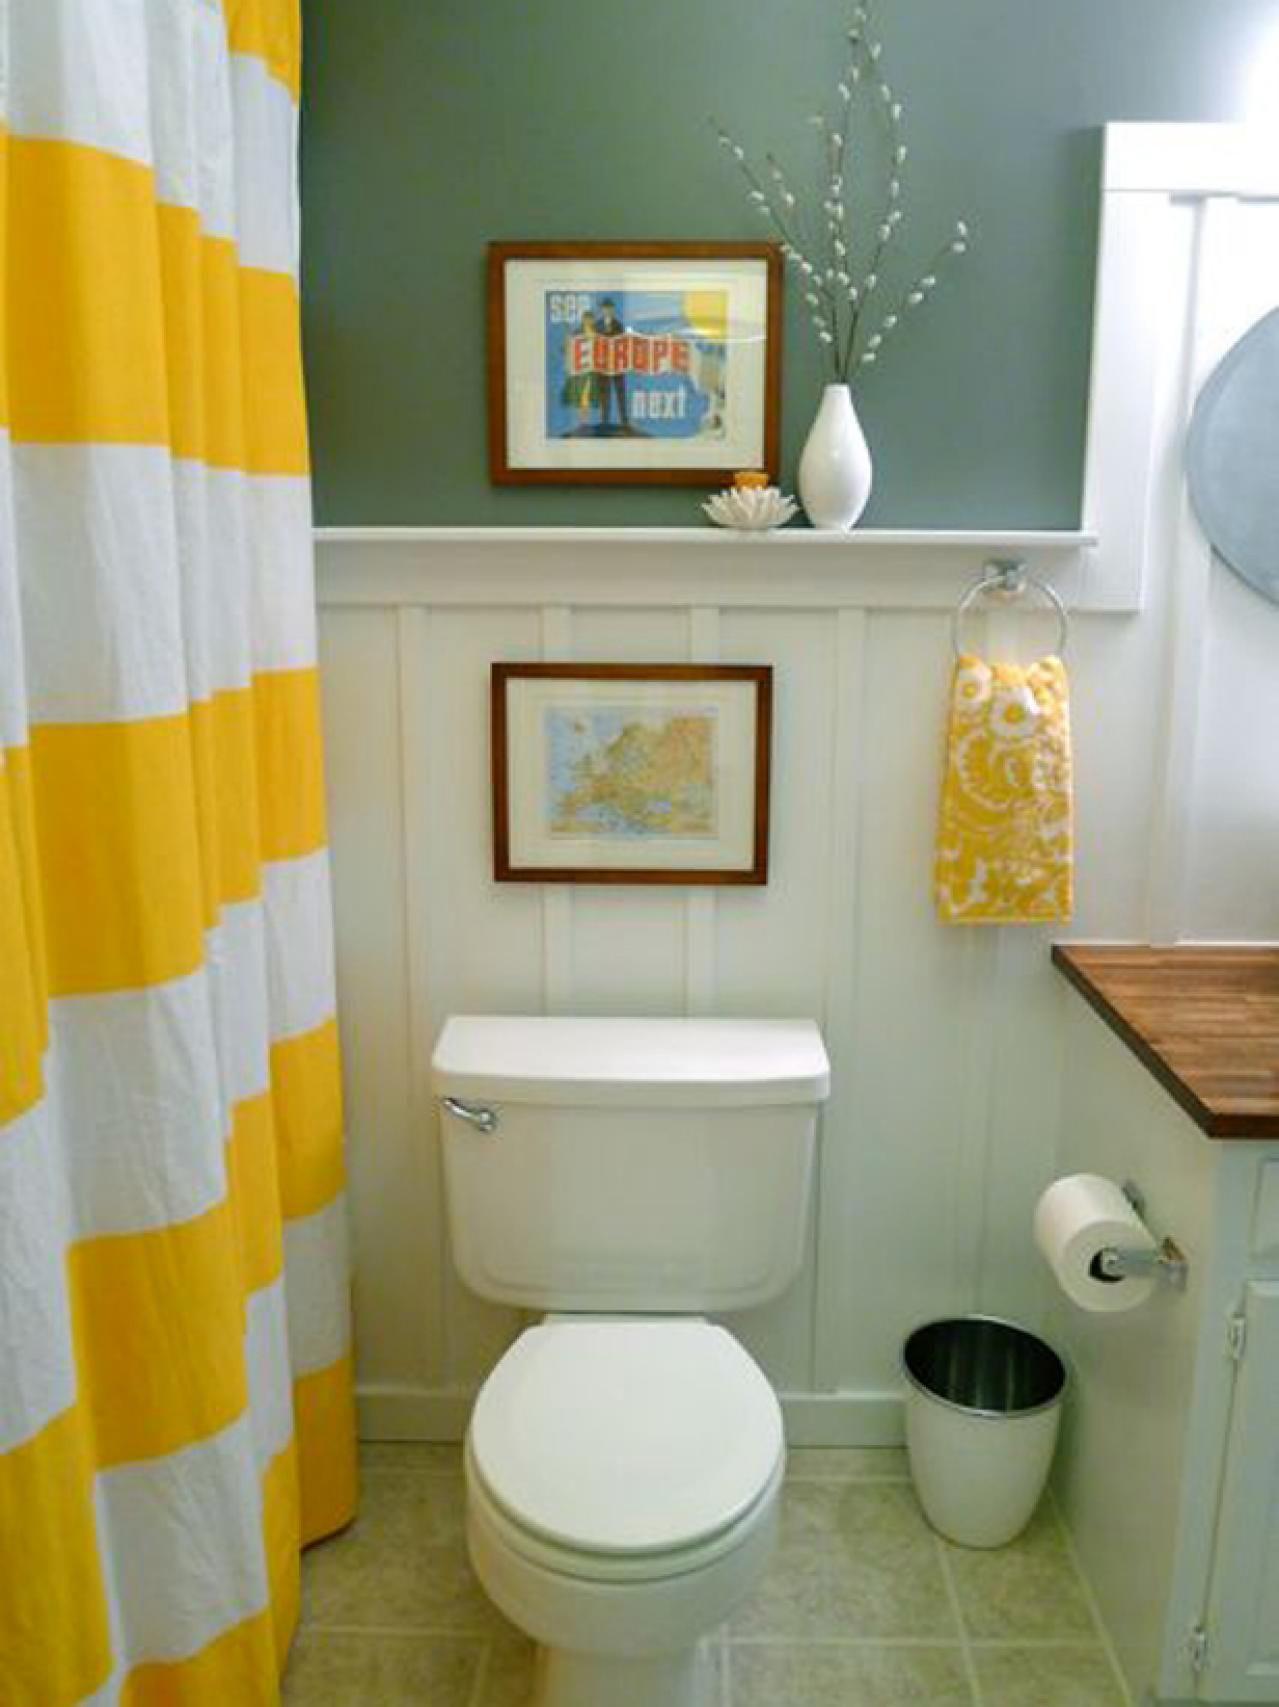 Bathroom Makeovers On A Budget. Budget Bathroom Makeovers Bathroom Ideas Design With Vanities Tile Cabinets Sinks Hgtv